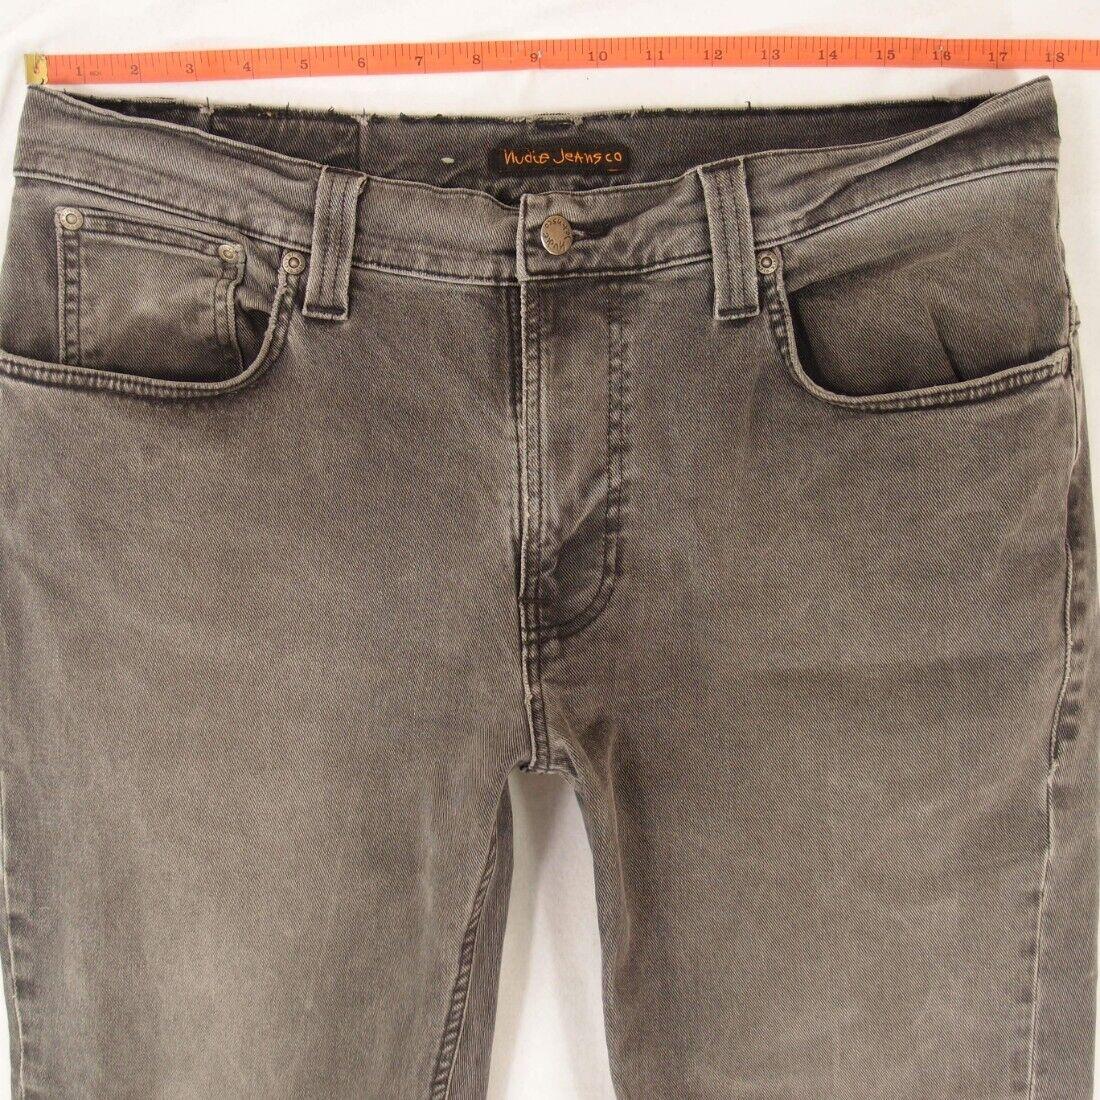 1ec492e4 Mens Nudie THIN FINN Stretch Slim Straight Jeans W35 W36 L34 Grey ...